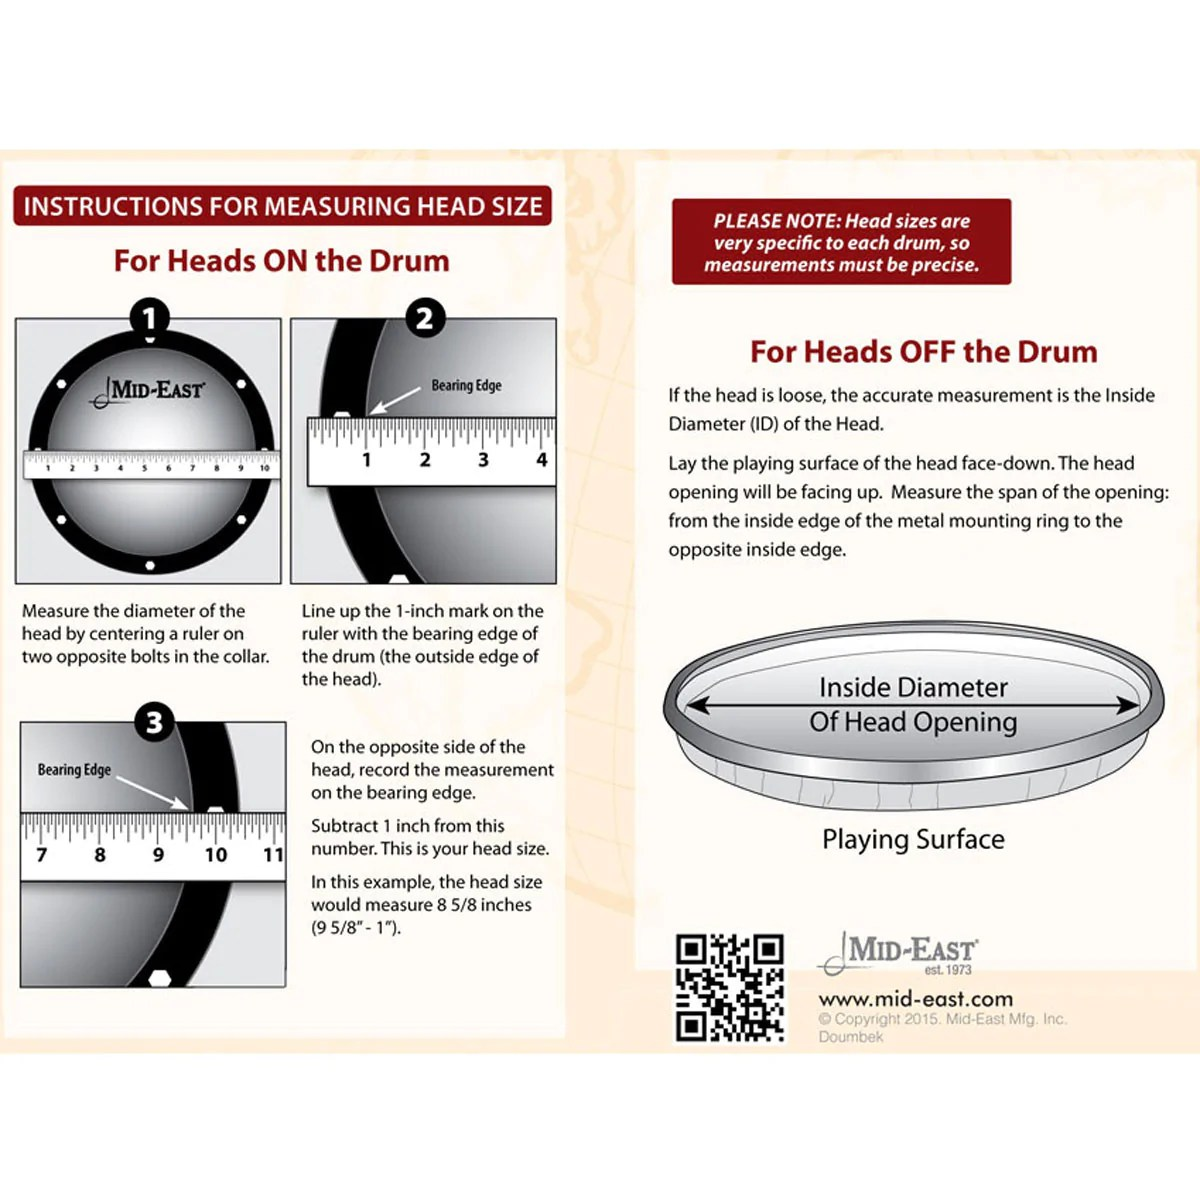 hight resolution of remo shoulder strap for externally tuned doumbek metal doumbek accessories hk 3200 dk instrumantra